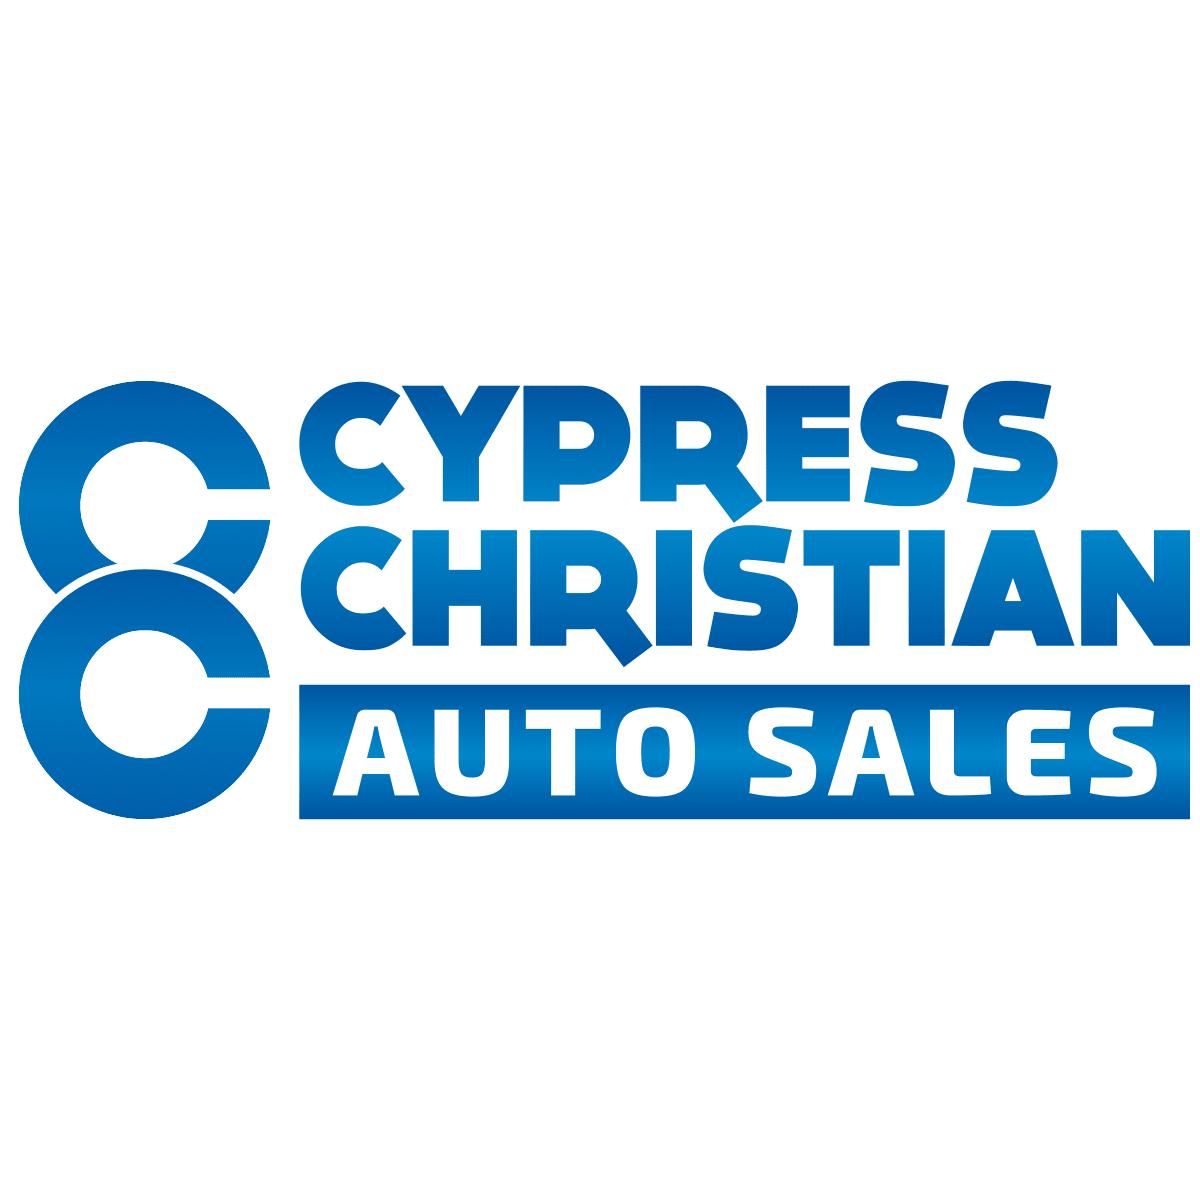 CYPRESS CHRISTIAN AUTO SALES image 0